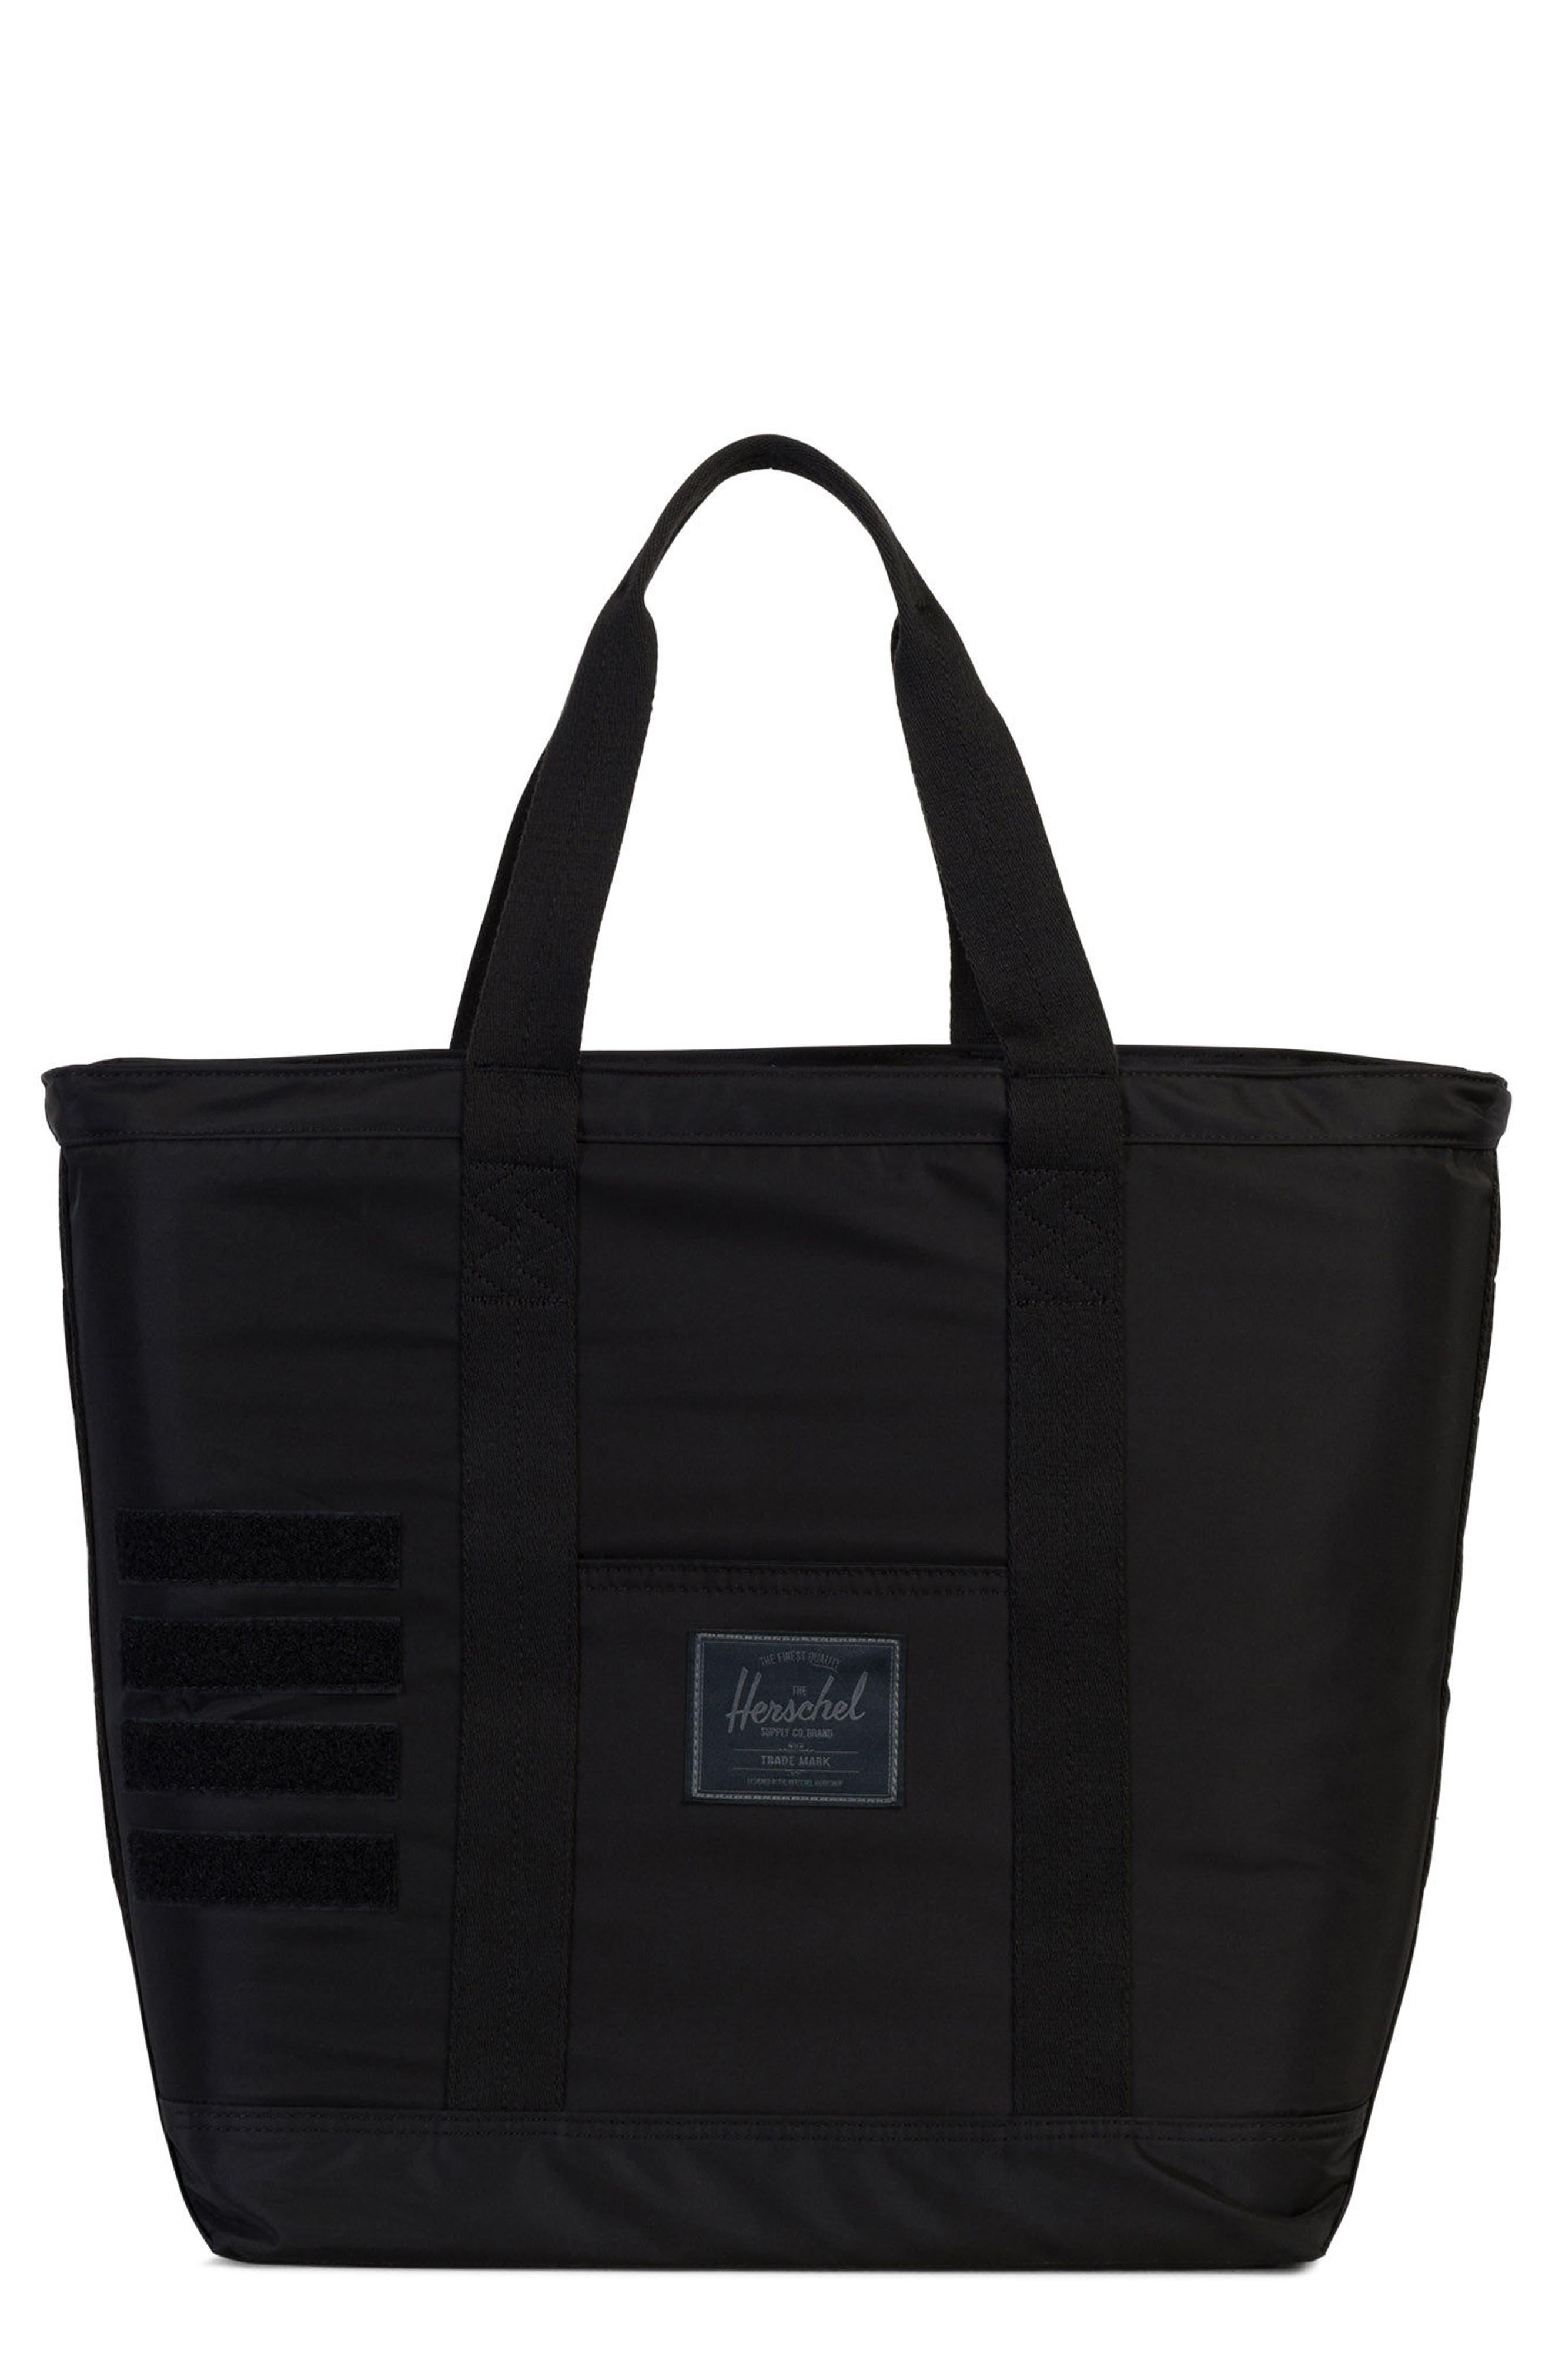 Herschel Supply Co. Bamfield Surplus Collection Tote Bag